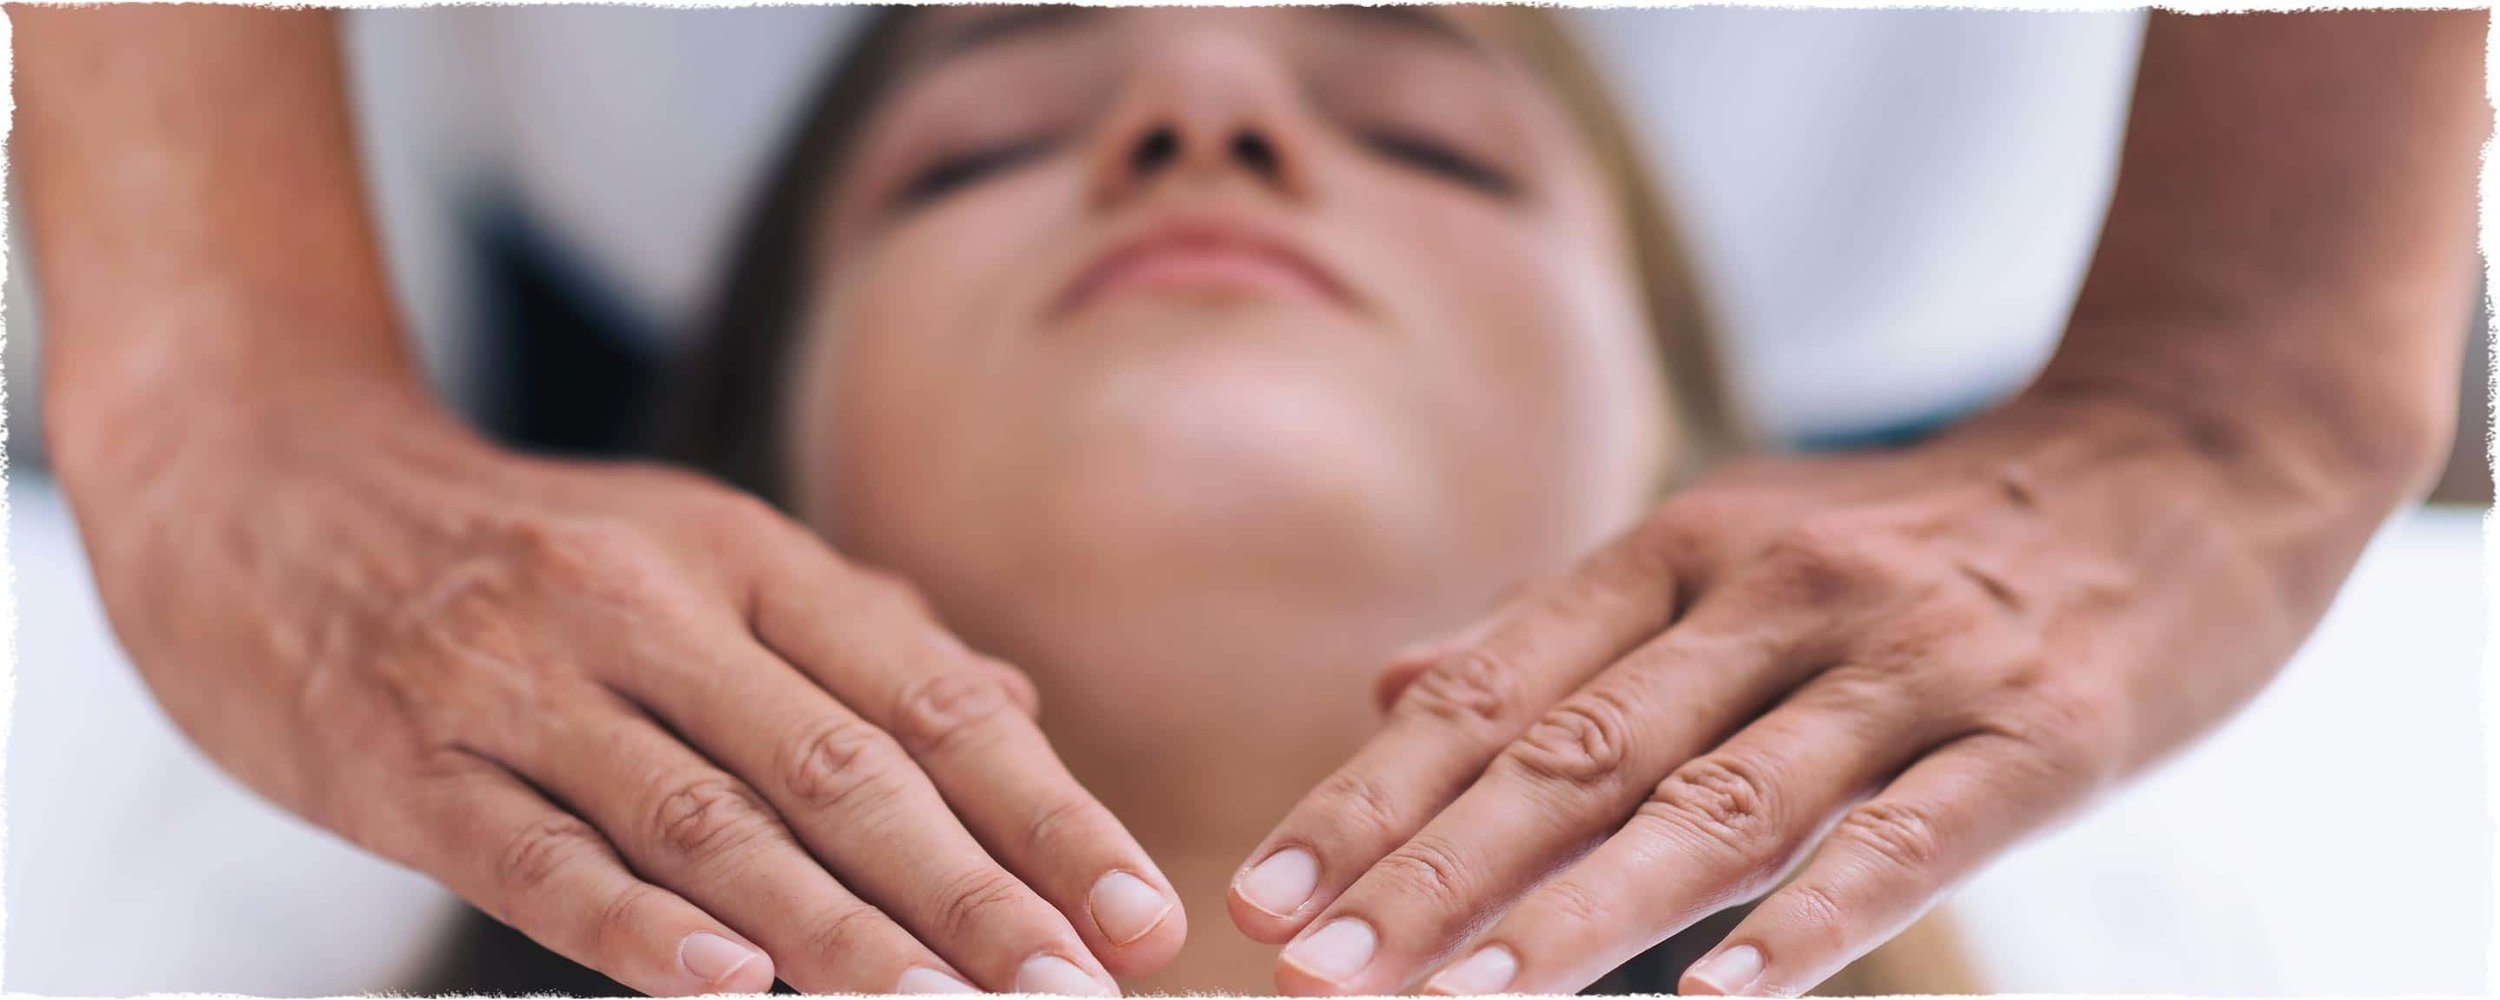 healing-hands-bridging-bg@2x.jpg